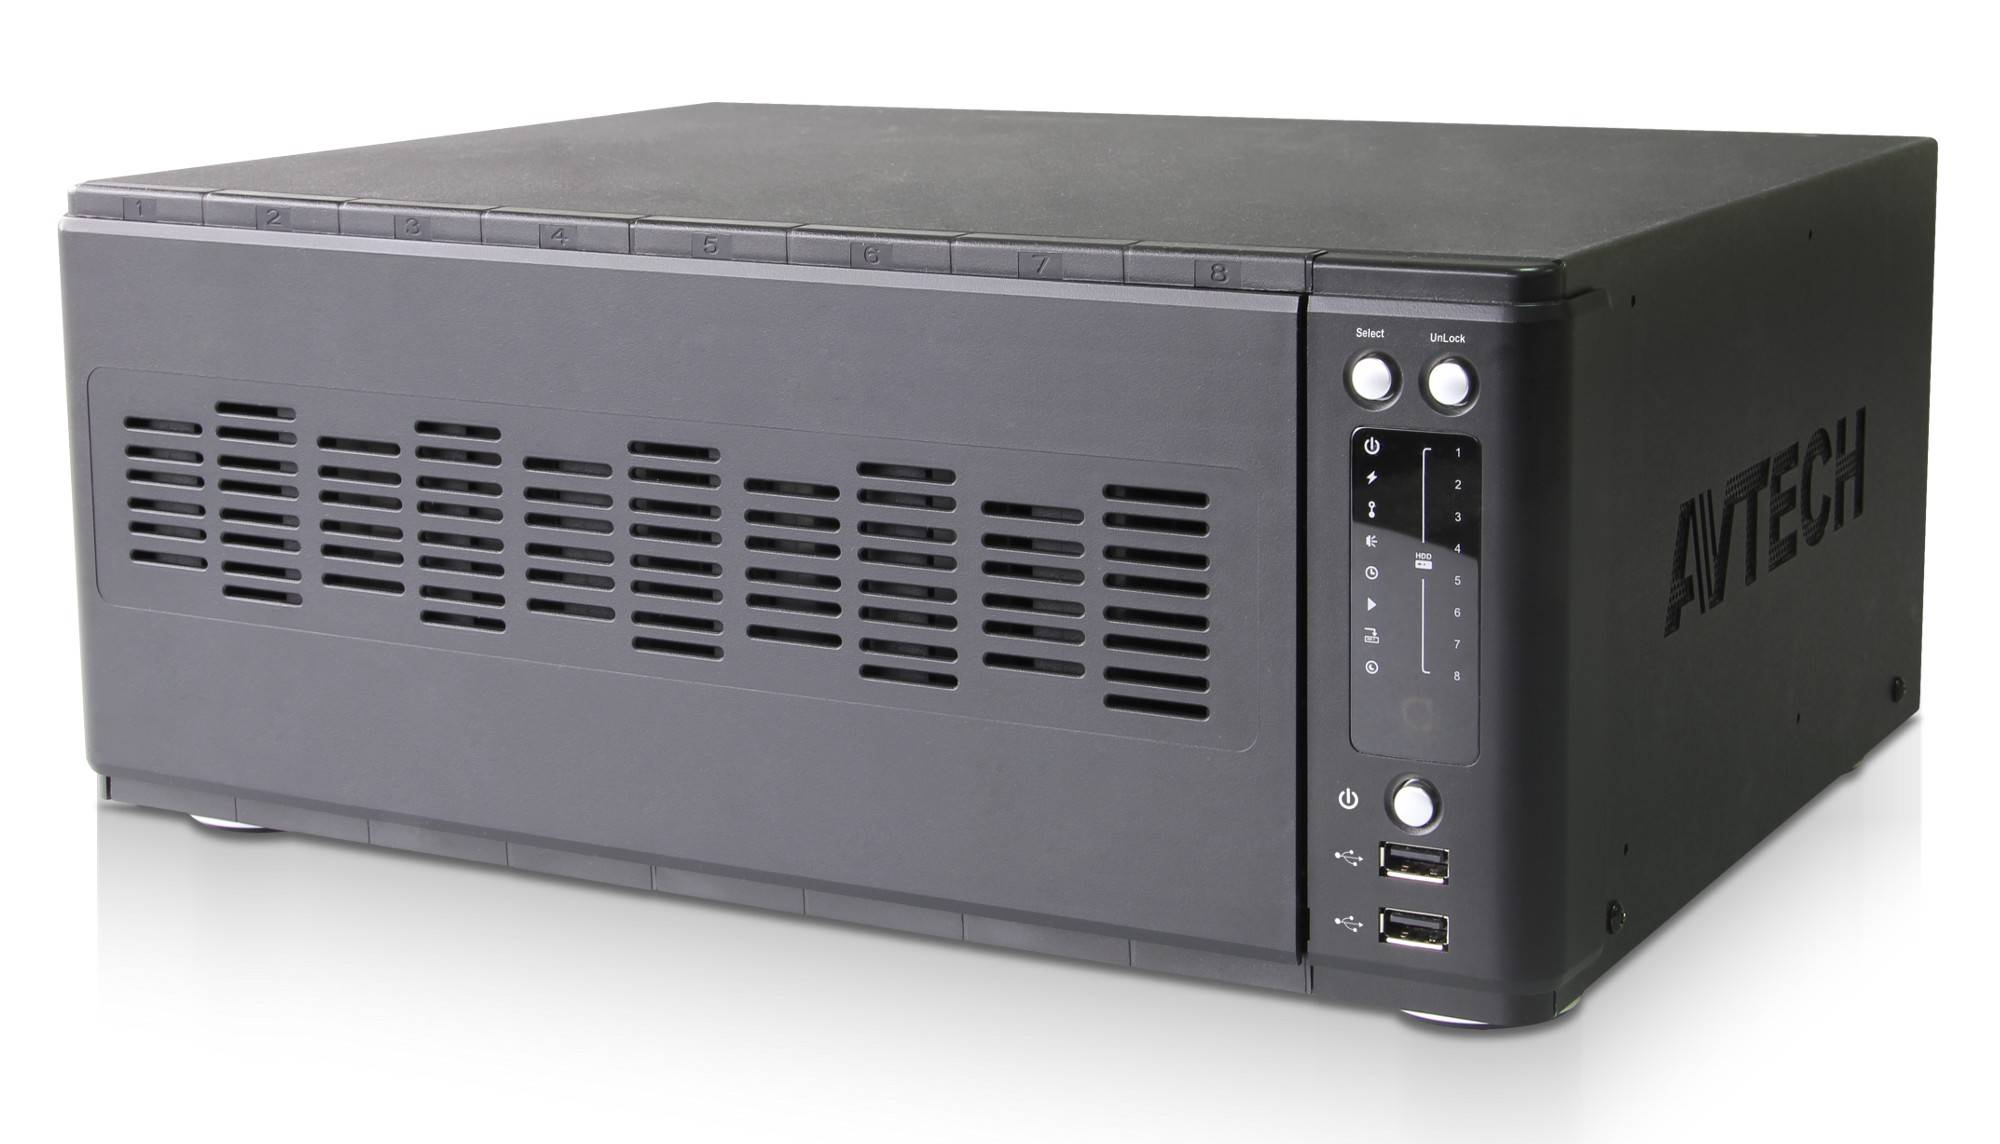 Avtech Videoregistratore NVR 36 Canali 8-bay H.265 AVH8536